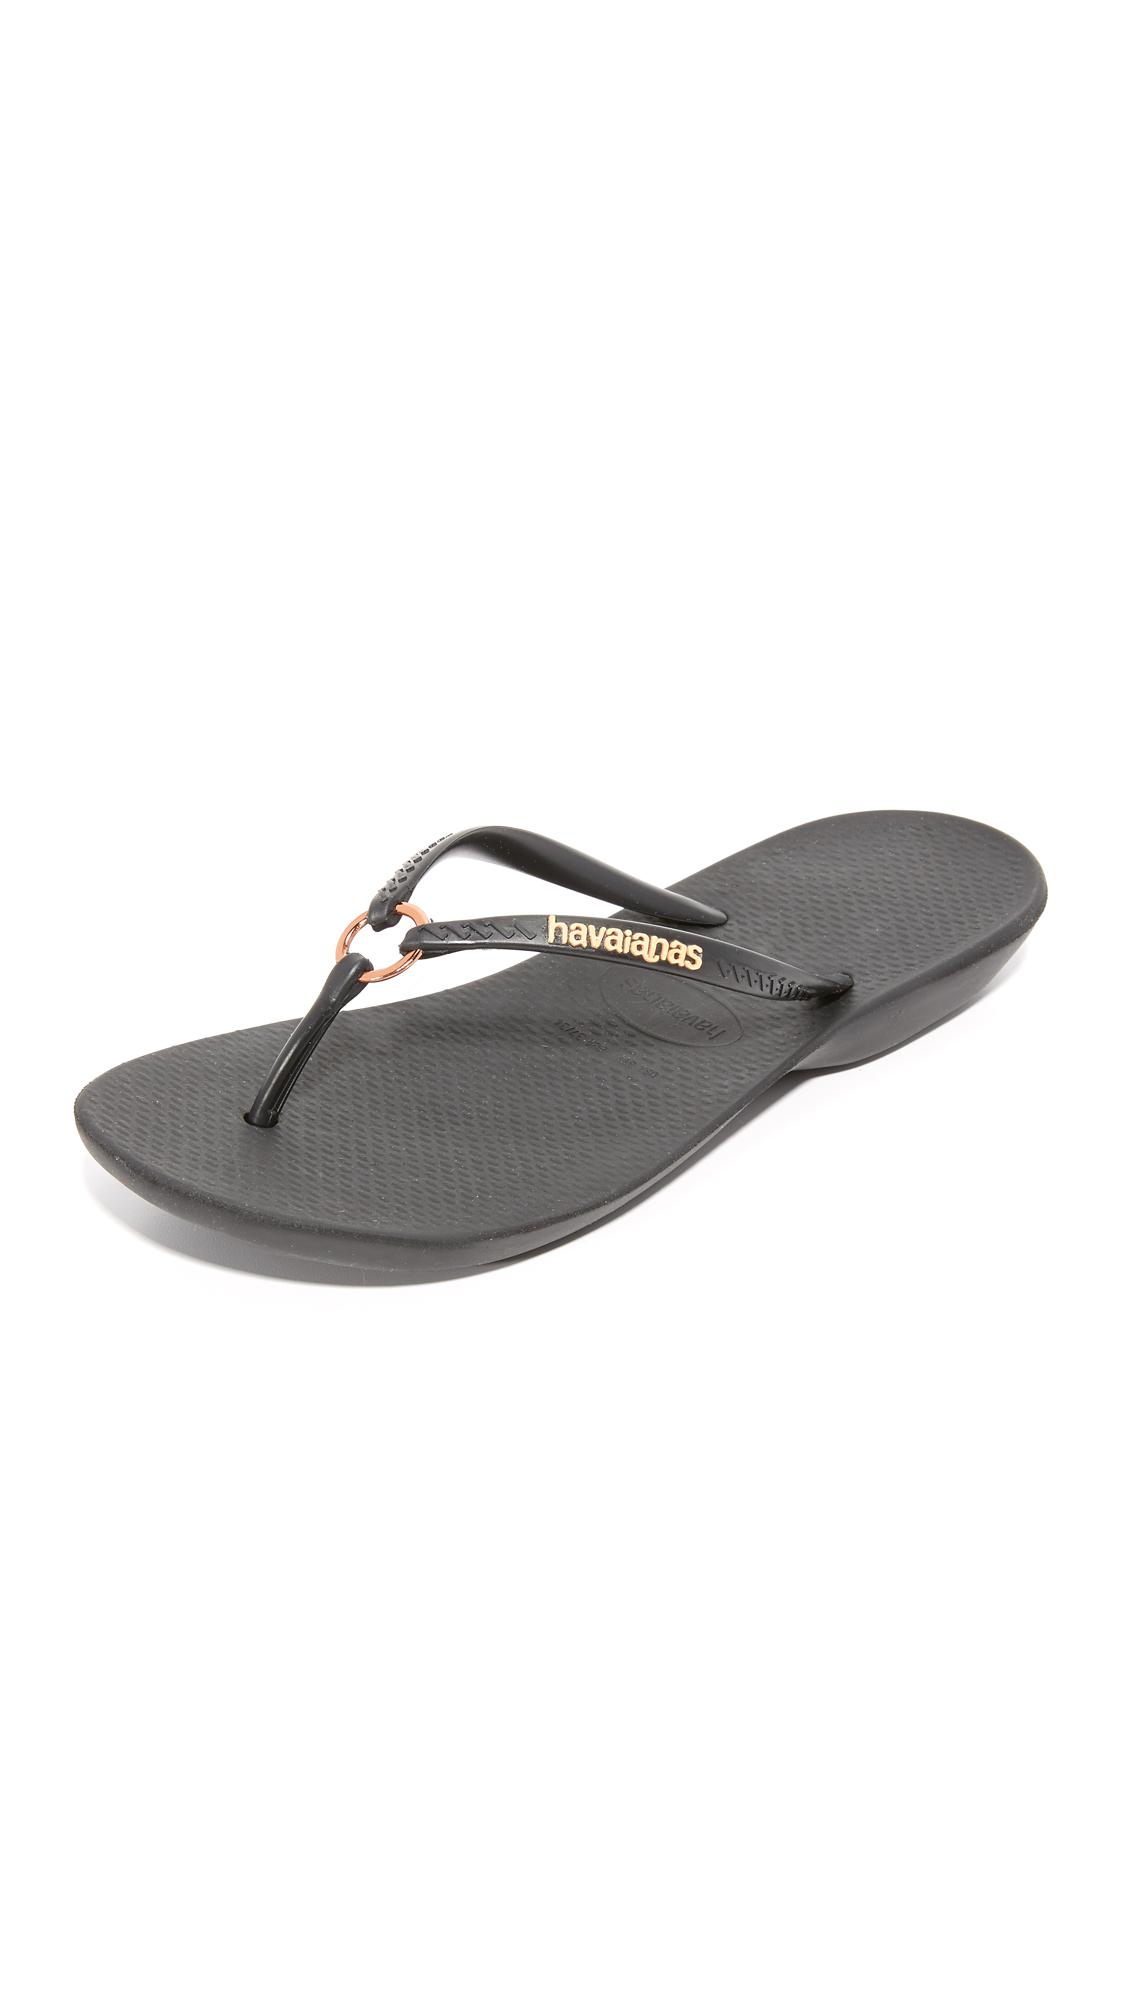 Havaianas Ring Flip Flops - Black at Shopbop